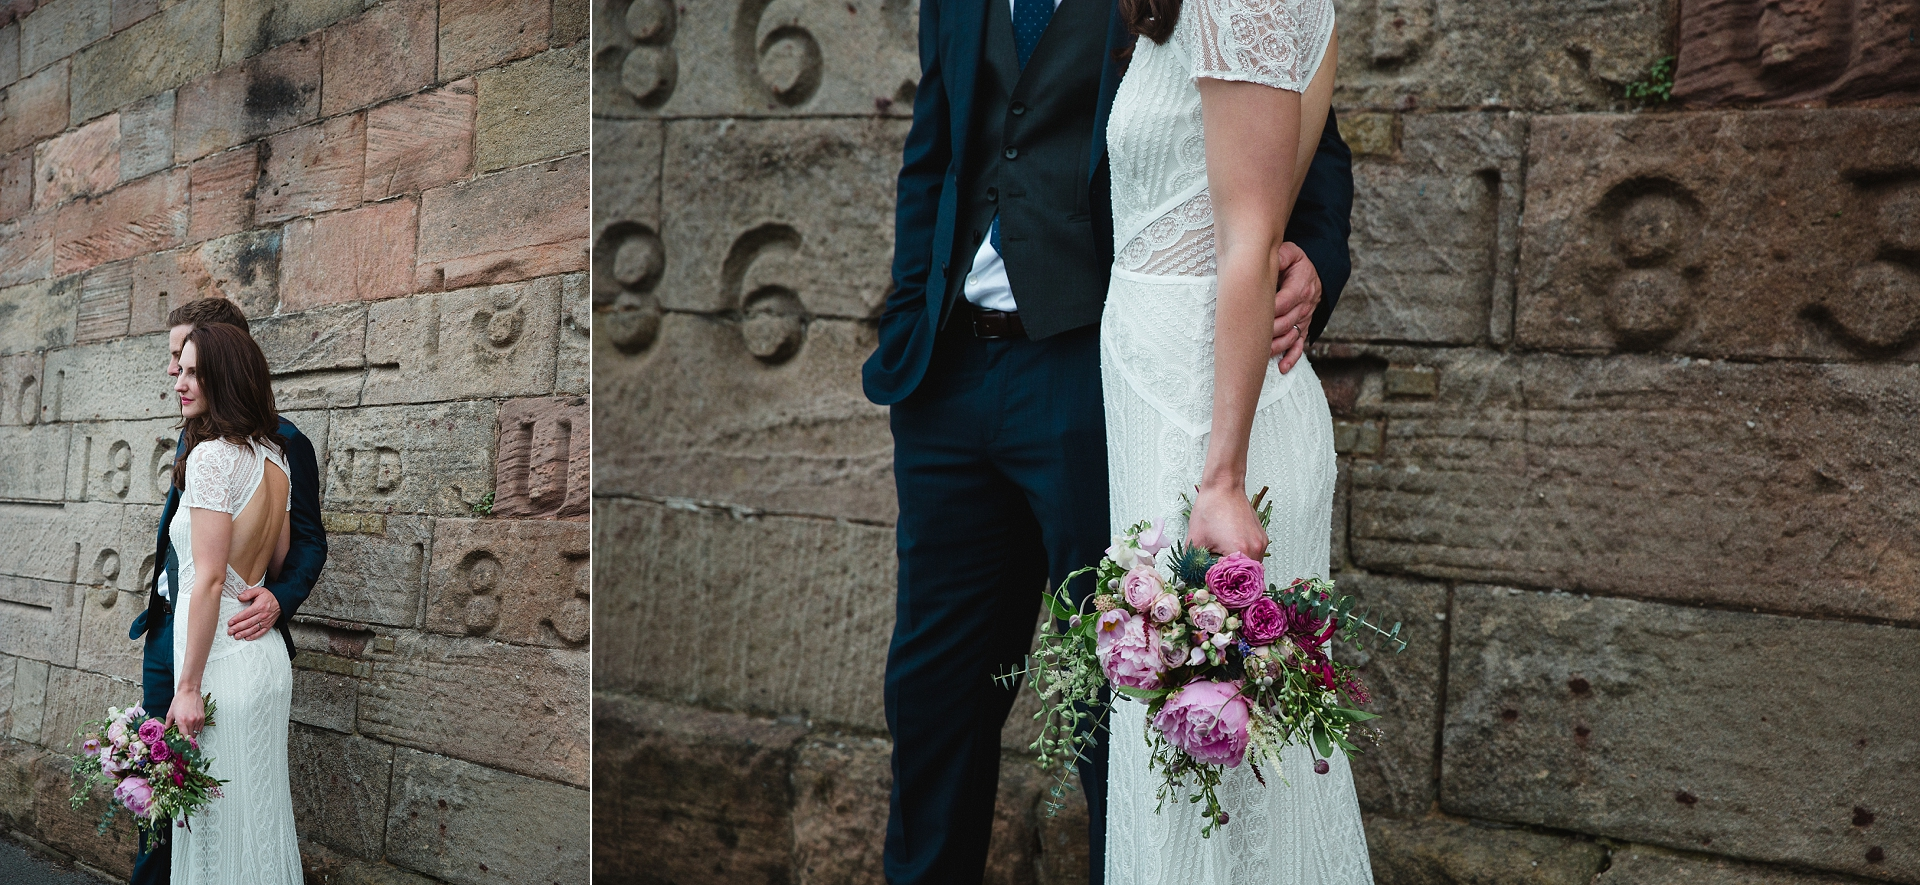 interesting wedding photographs